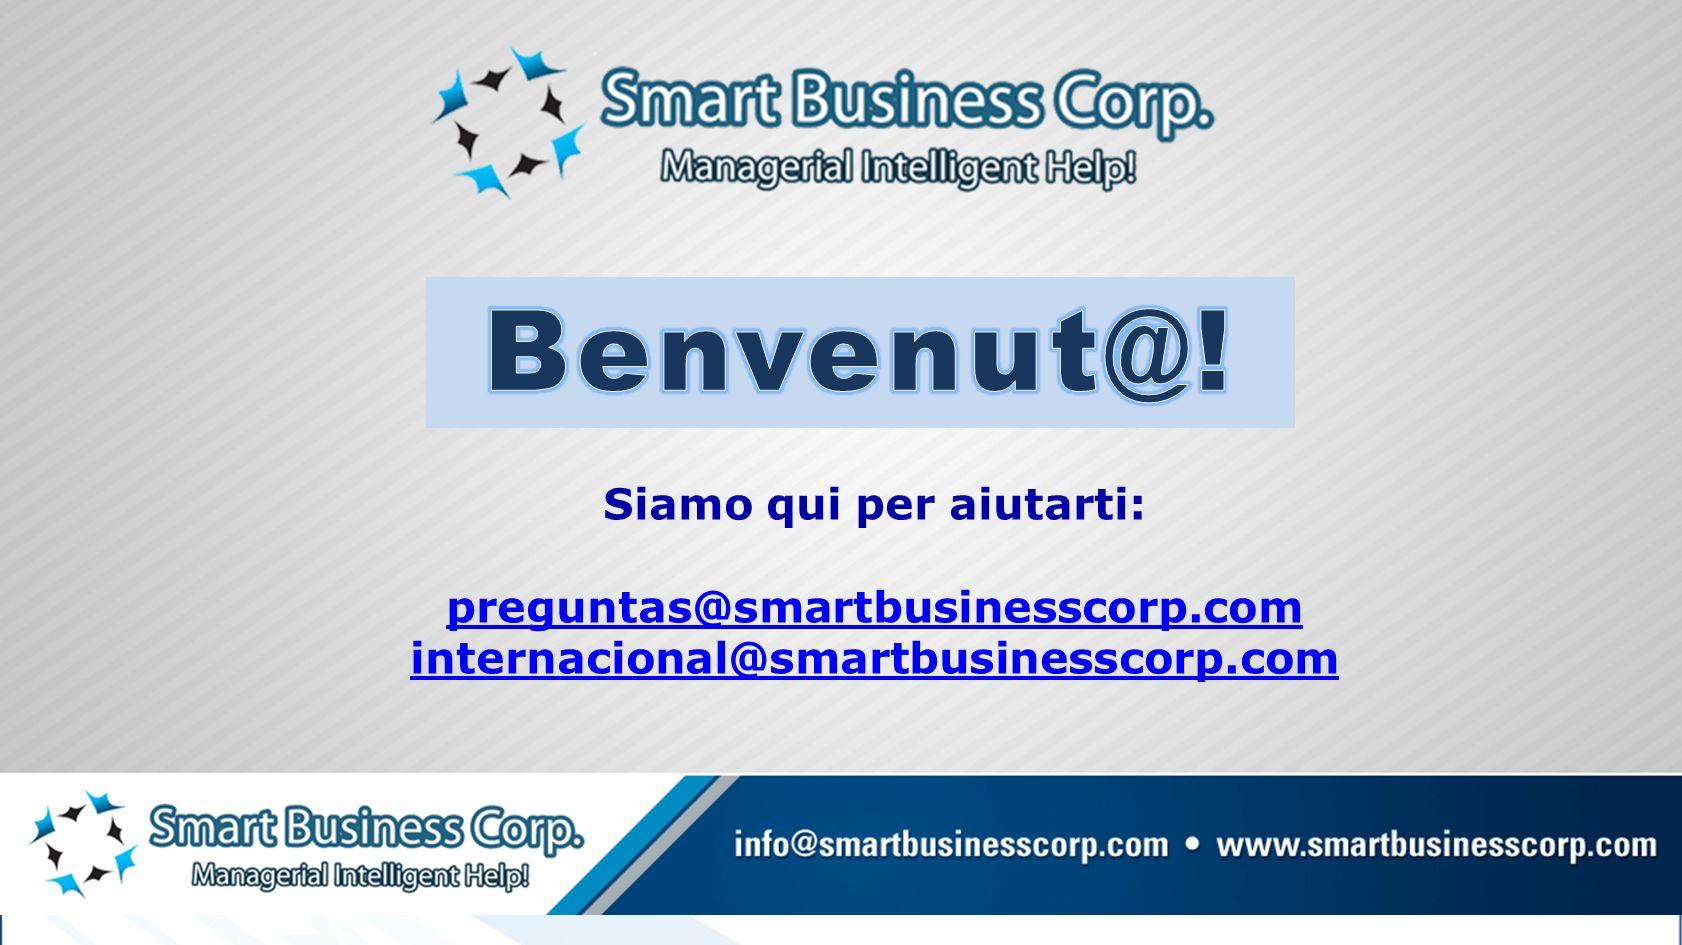 Siamo qui per aiutarti: preguntas@smartbusinesscorp.com internacional@smartbusinesscorp.com